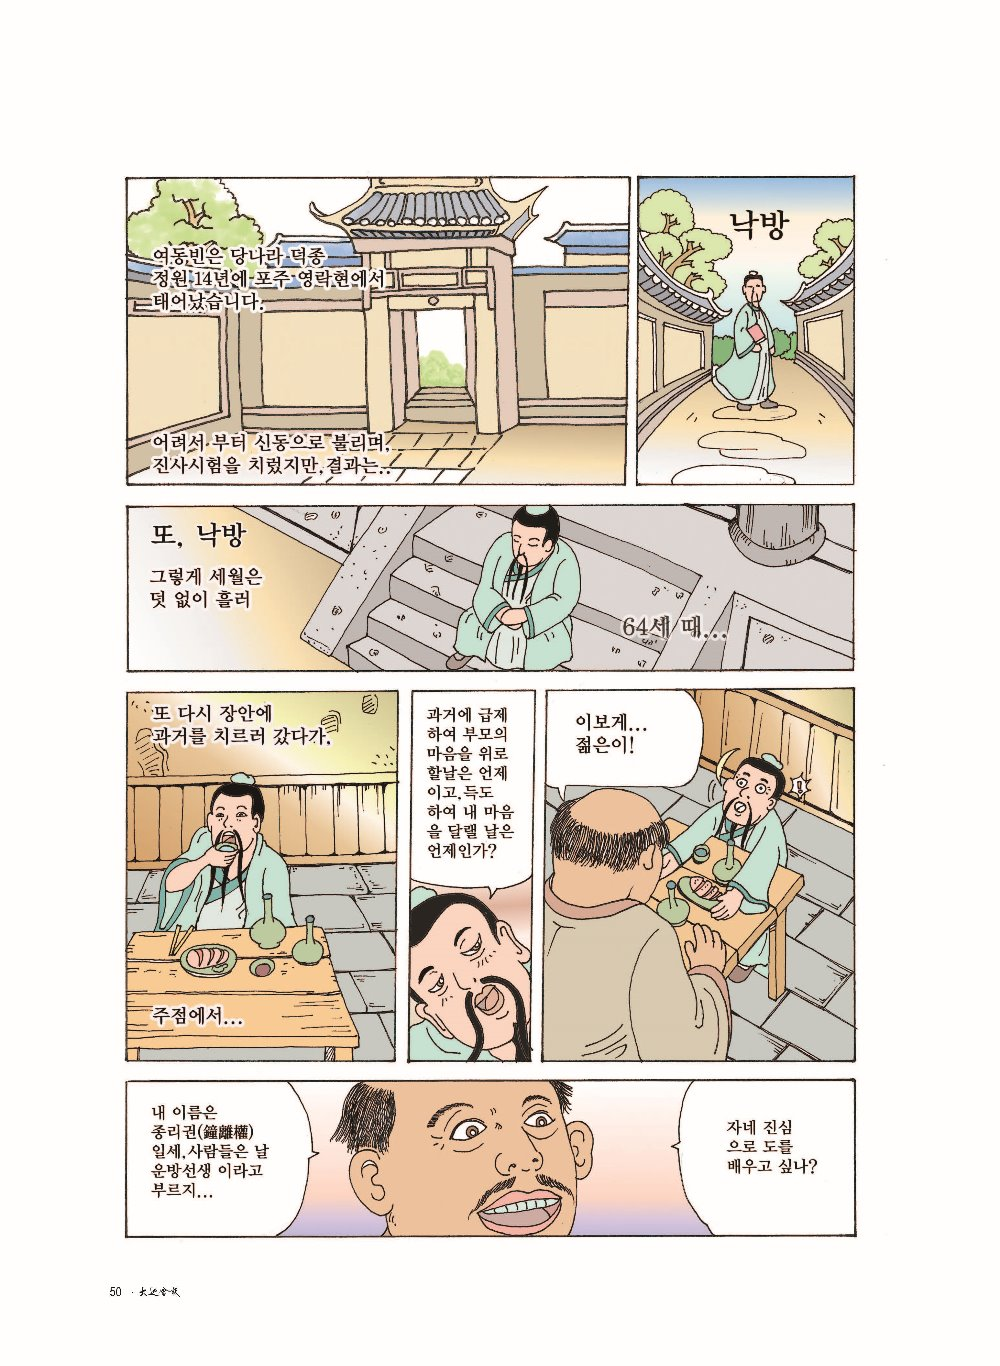 Daesoon_158_만화_페이지_3.jpg